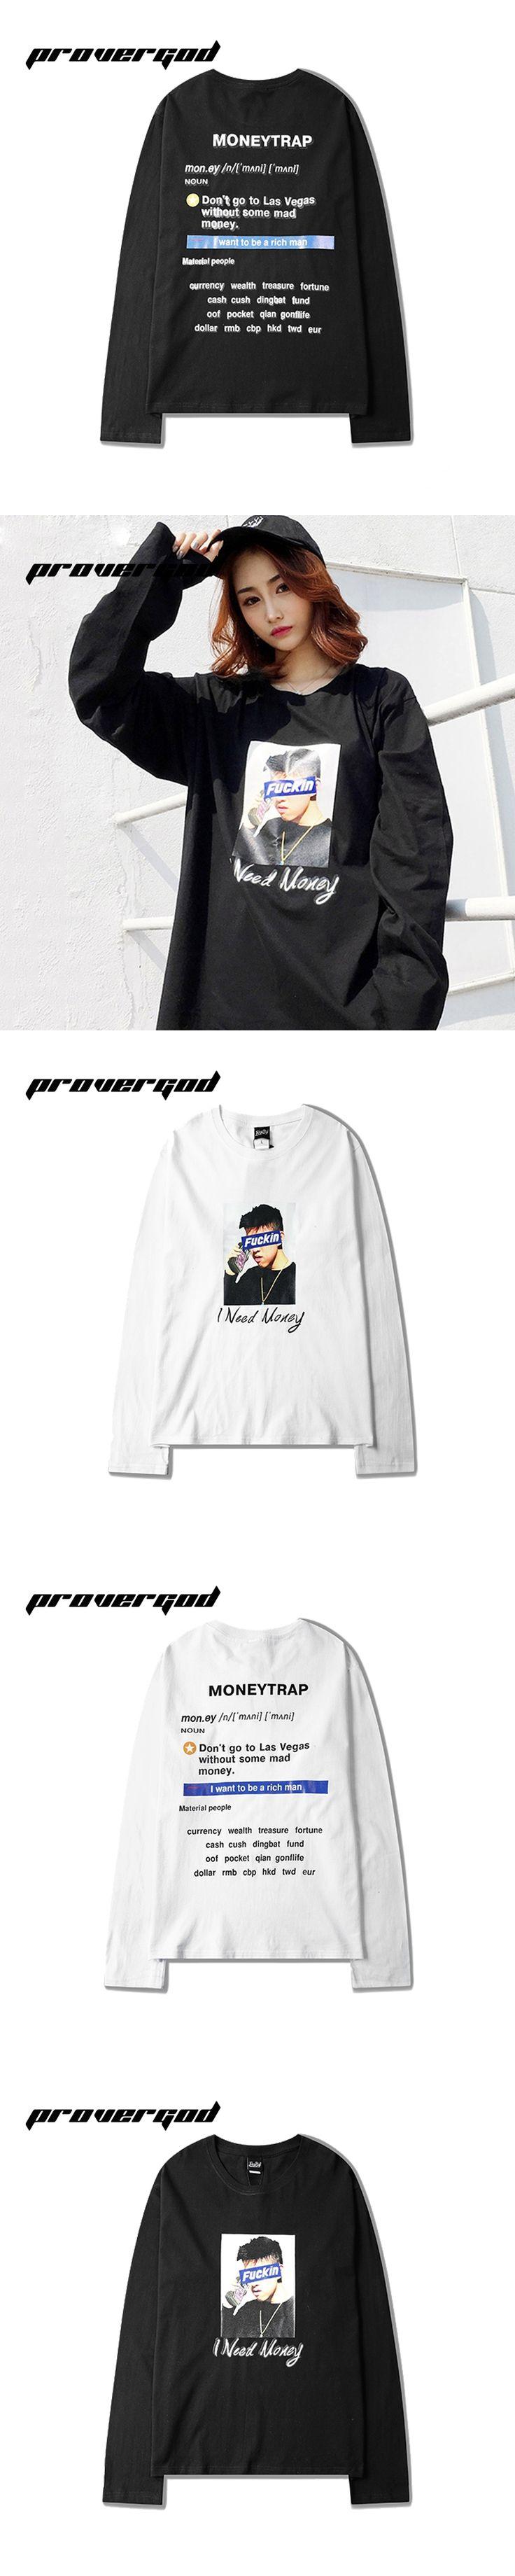 PROVERGOD I Want To Be Rich Man T Shirt High Street Cotton T-shirt Mens O Neck Long Sleeve Tops Tees Oversize